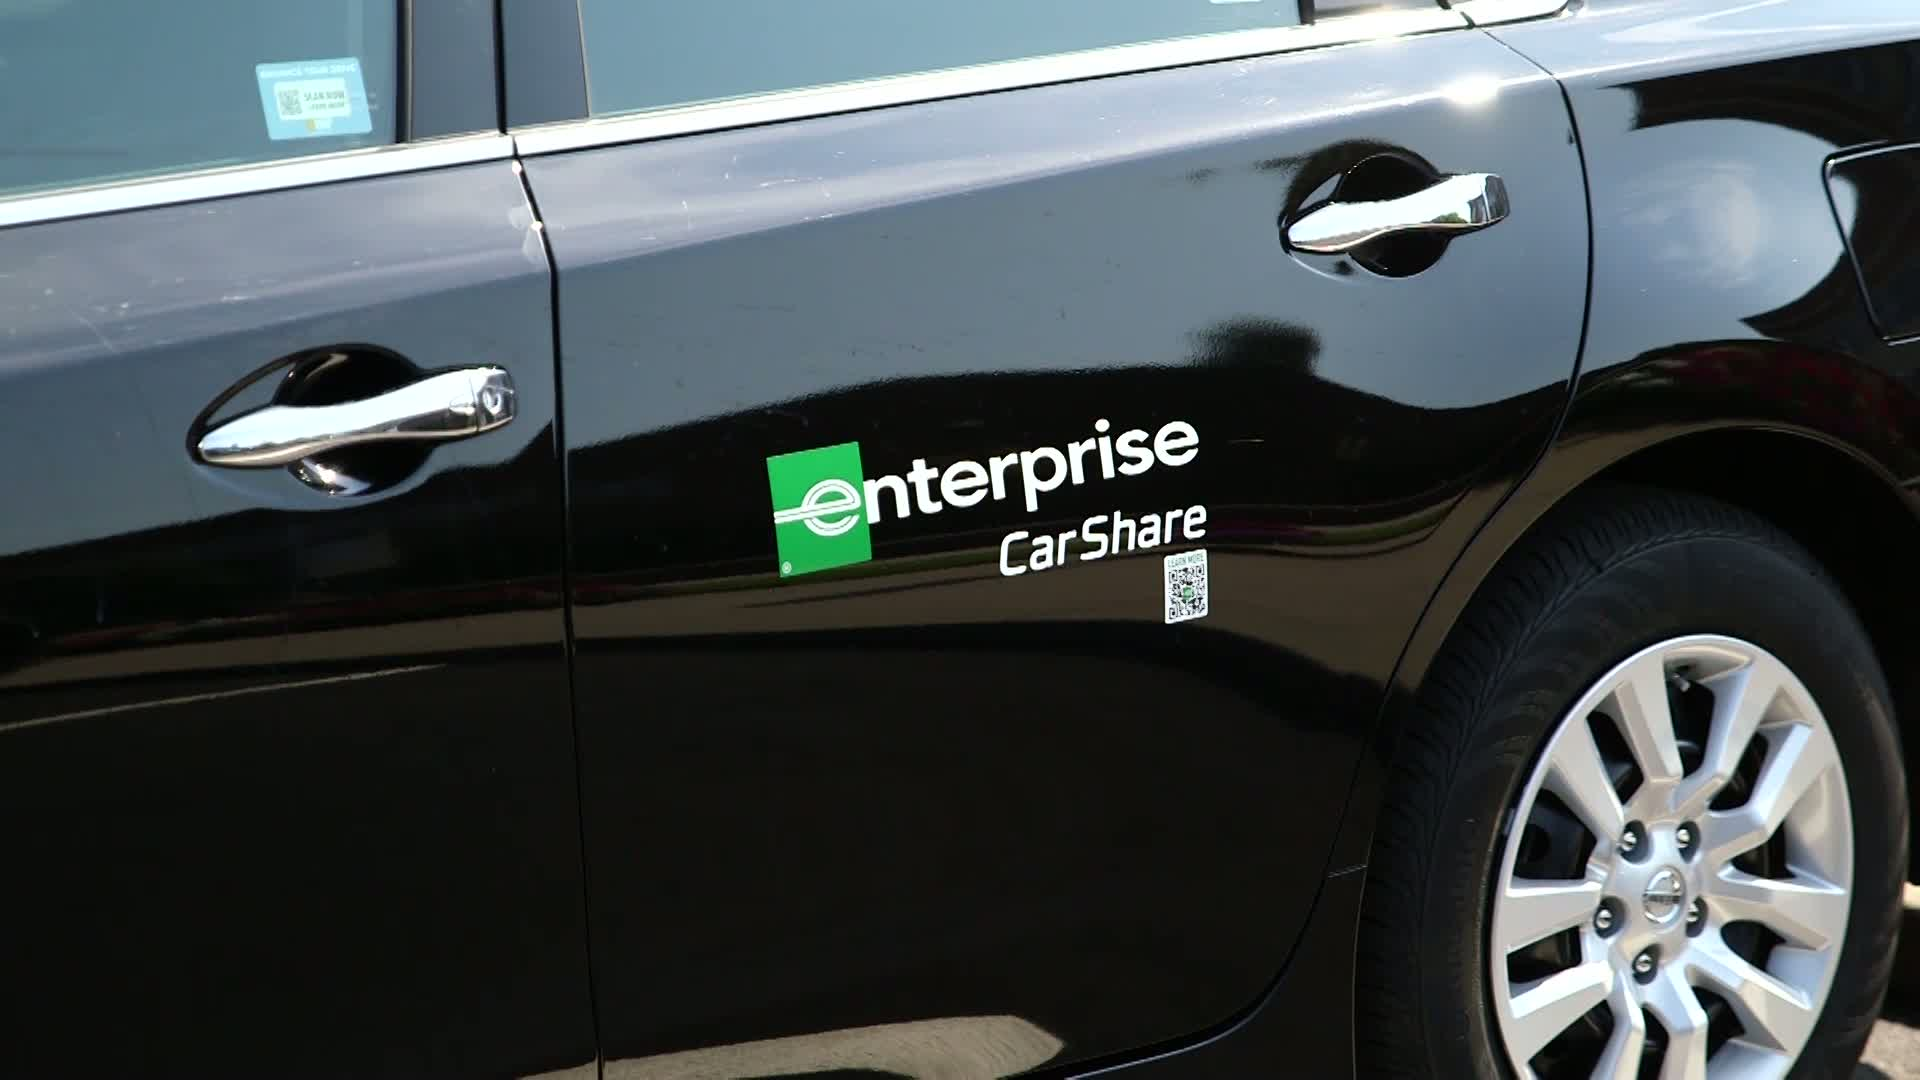 Enterprise Car Share Number >> Enterprise Carshare Nissan Launch Exclusive Partnership On